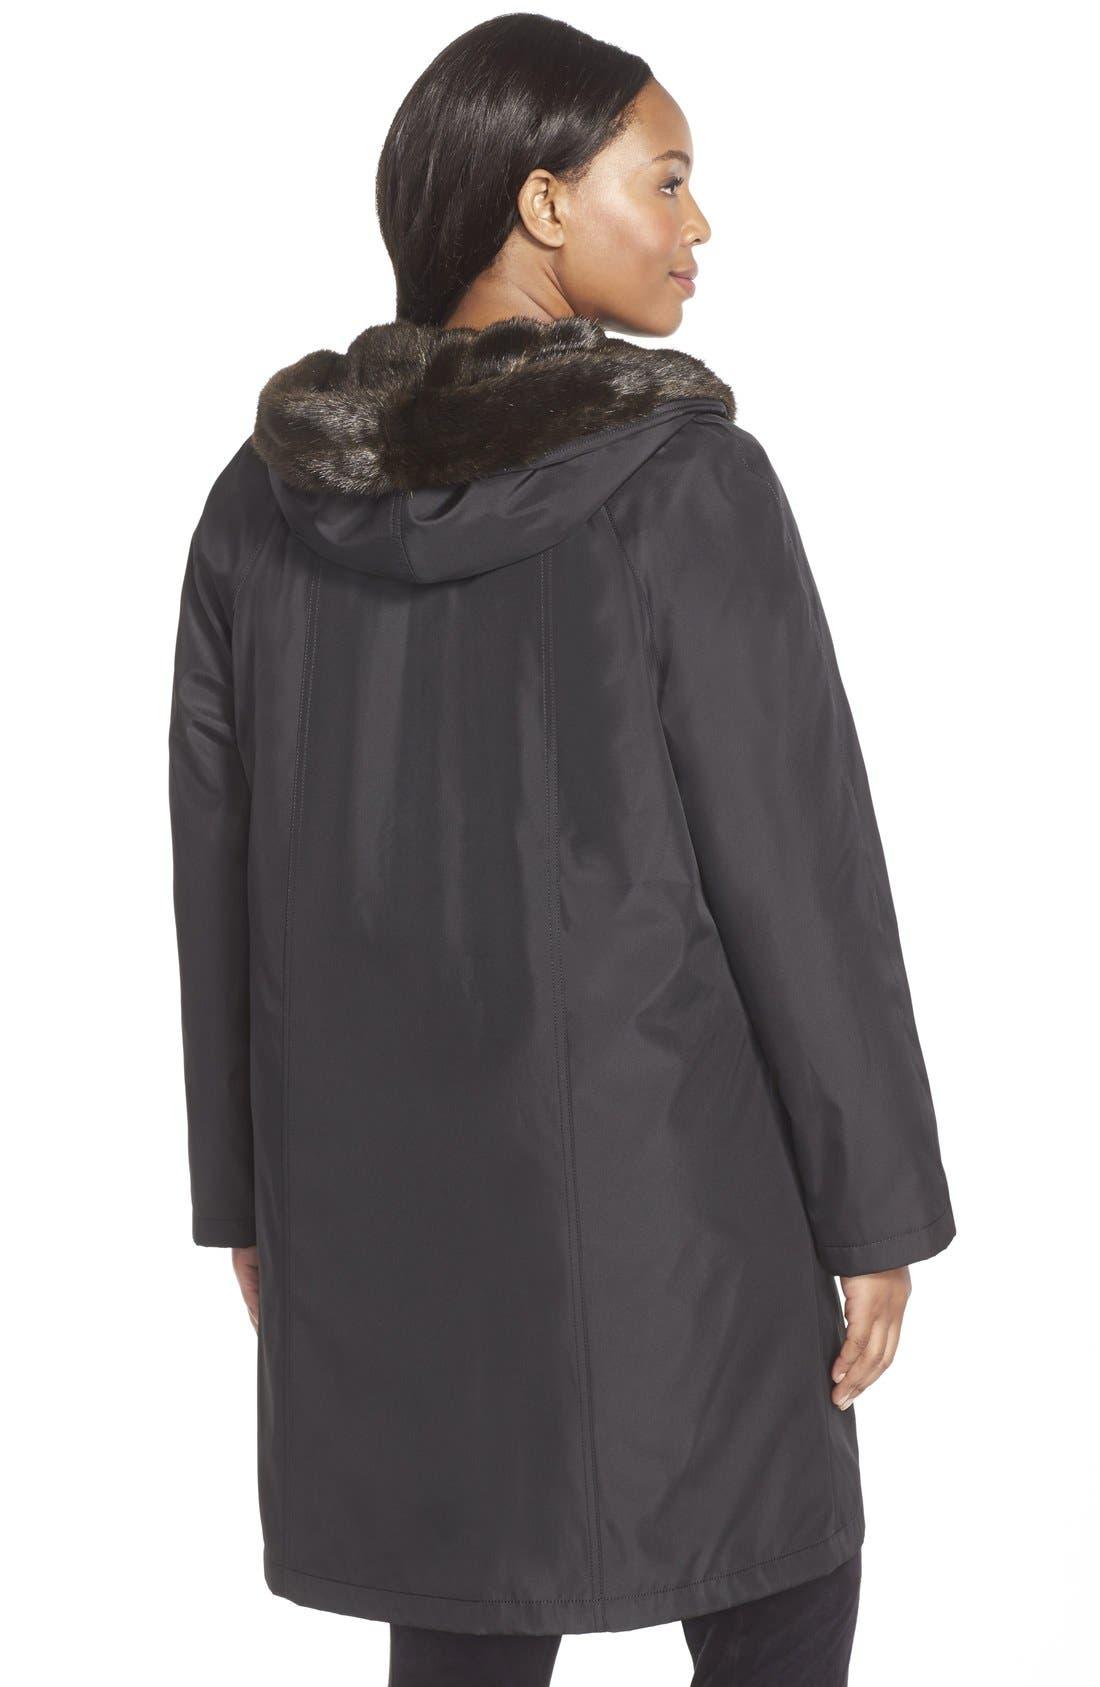 A-Line Storm Coat with FauxFur Lining & Trim,                             Alternate thumbnail 3, color,                             001